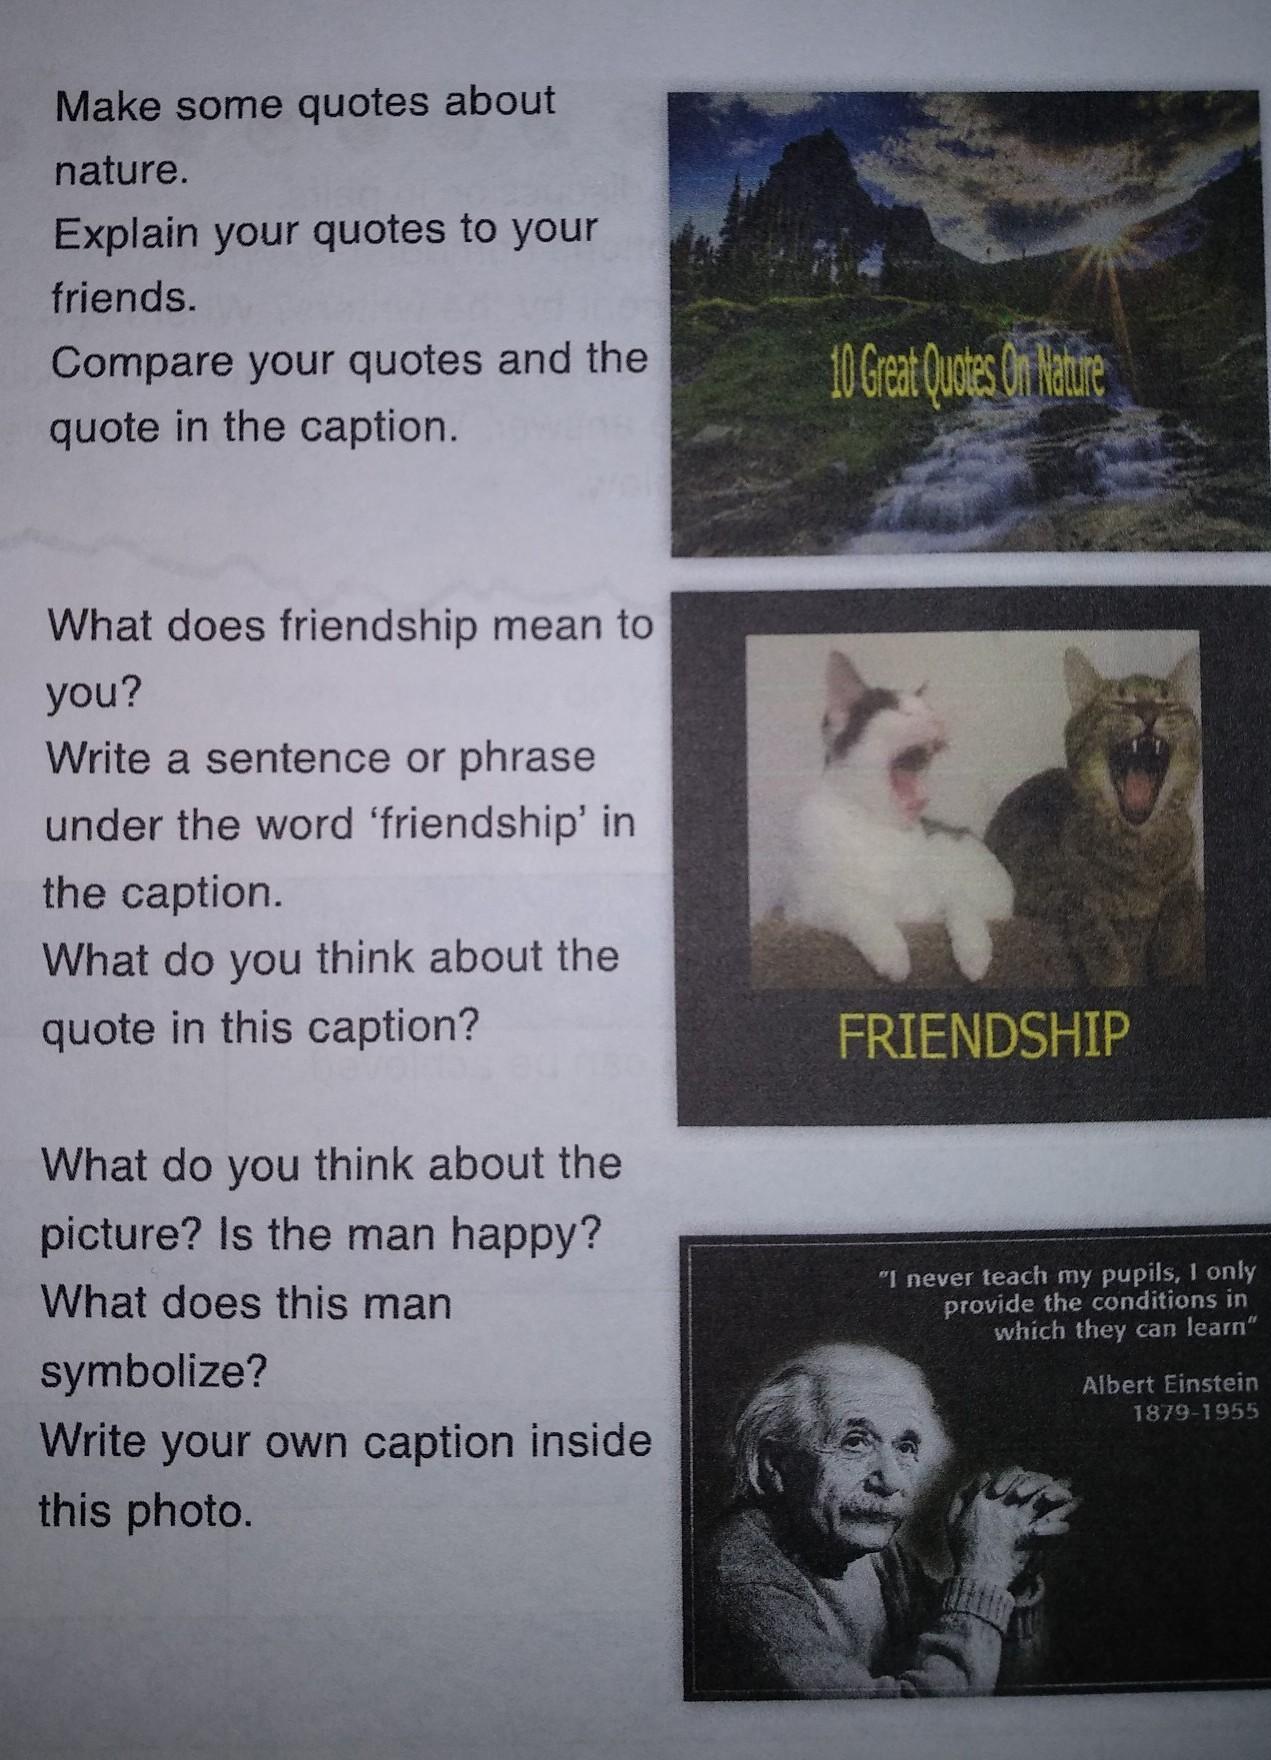 Contoh Soal Caption Dan Jawabannya : contoh, caption, jawabannya, Contoh, Bahasa, Inggris, Jawabannya, Tentang, Caption, IlmuSosial.id